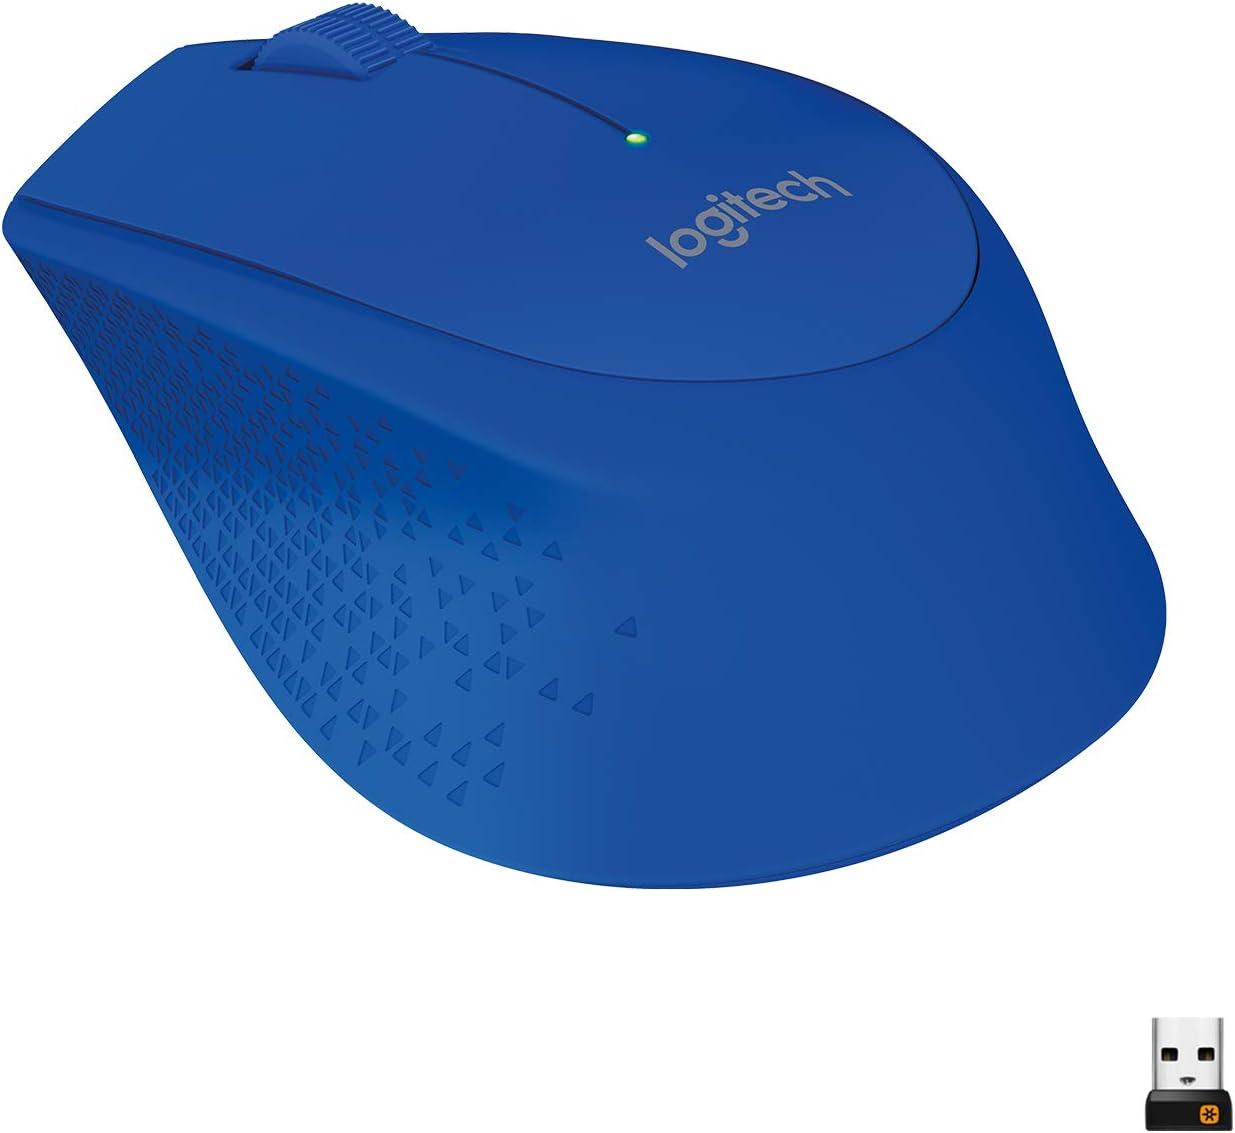 Logitech M280 Wireless Mouse 2 4 Ghz Connection Via Computers Accessories